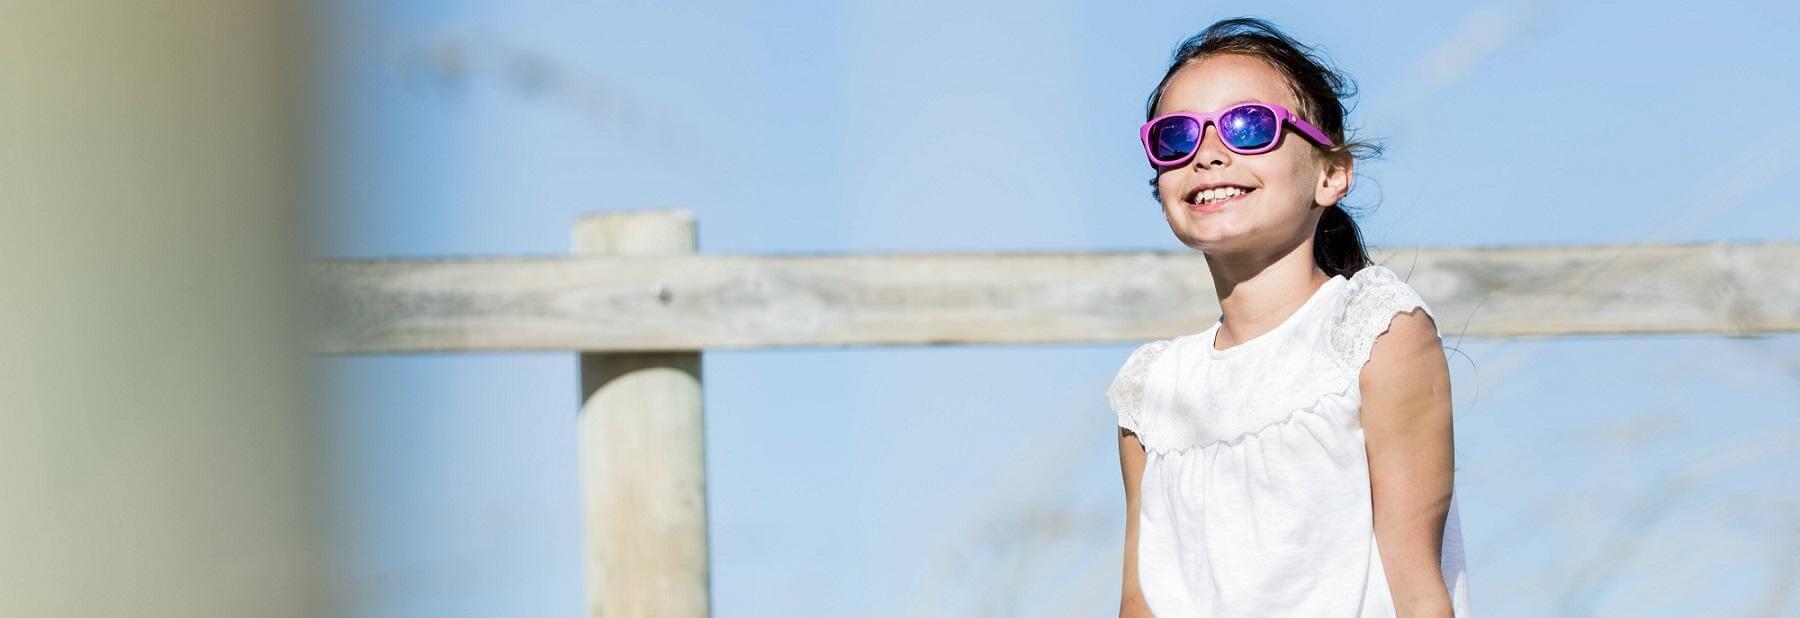 Kids have higher risk of eye damage from UV light